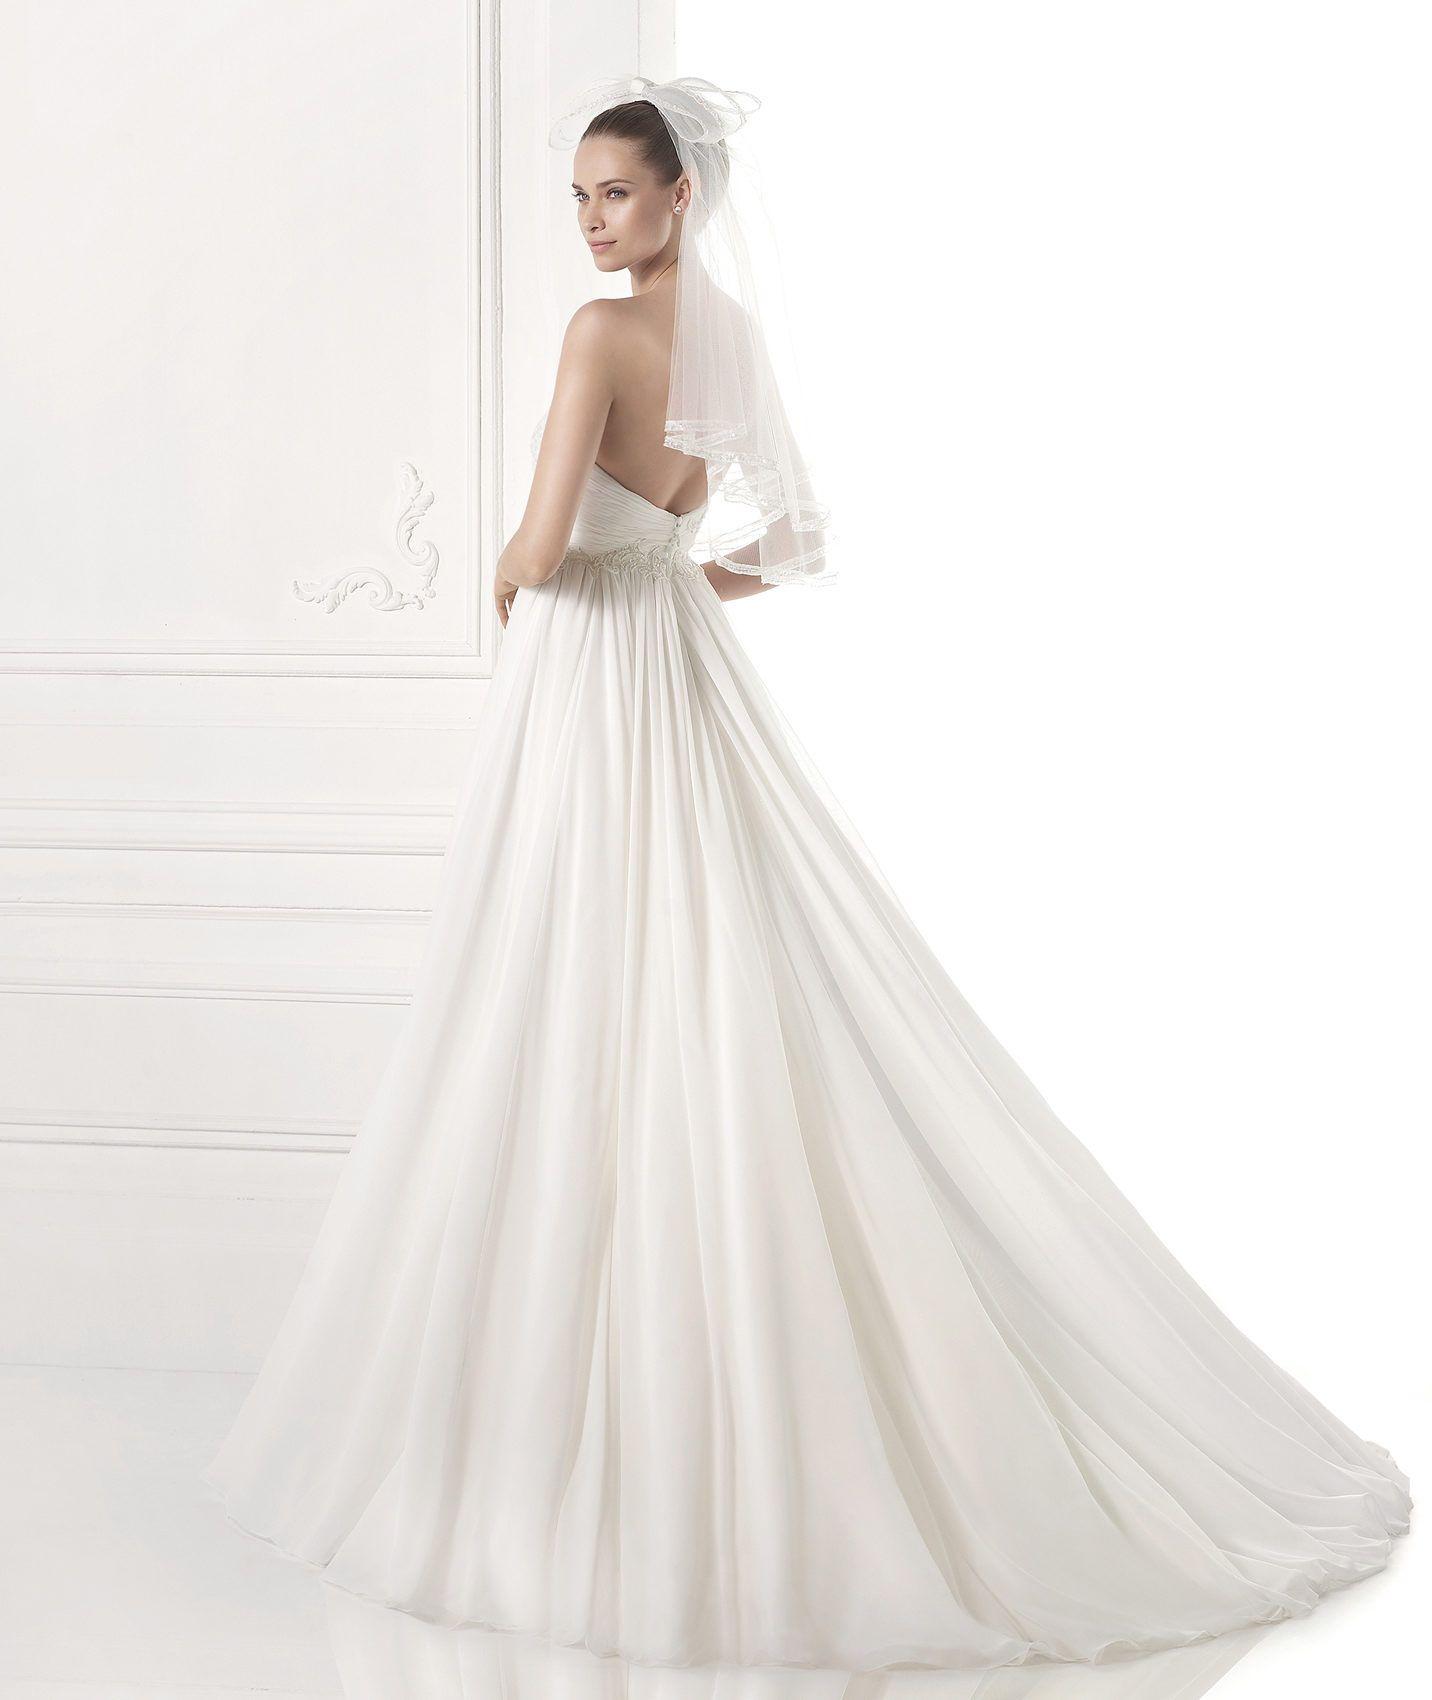 Wedding Dress With A Gathered Skirt. Collction